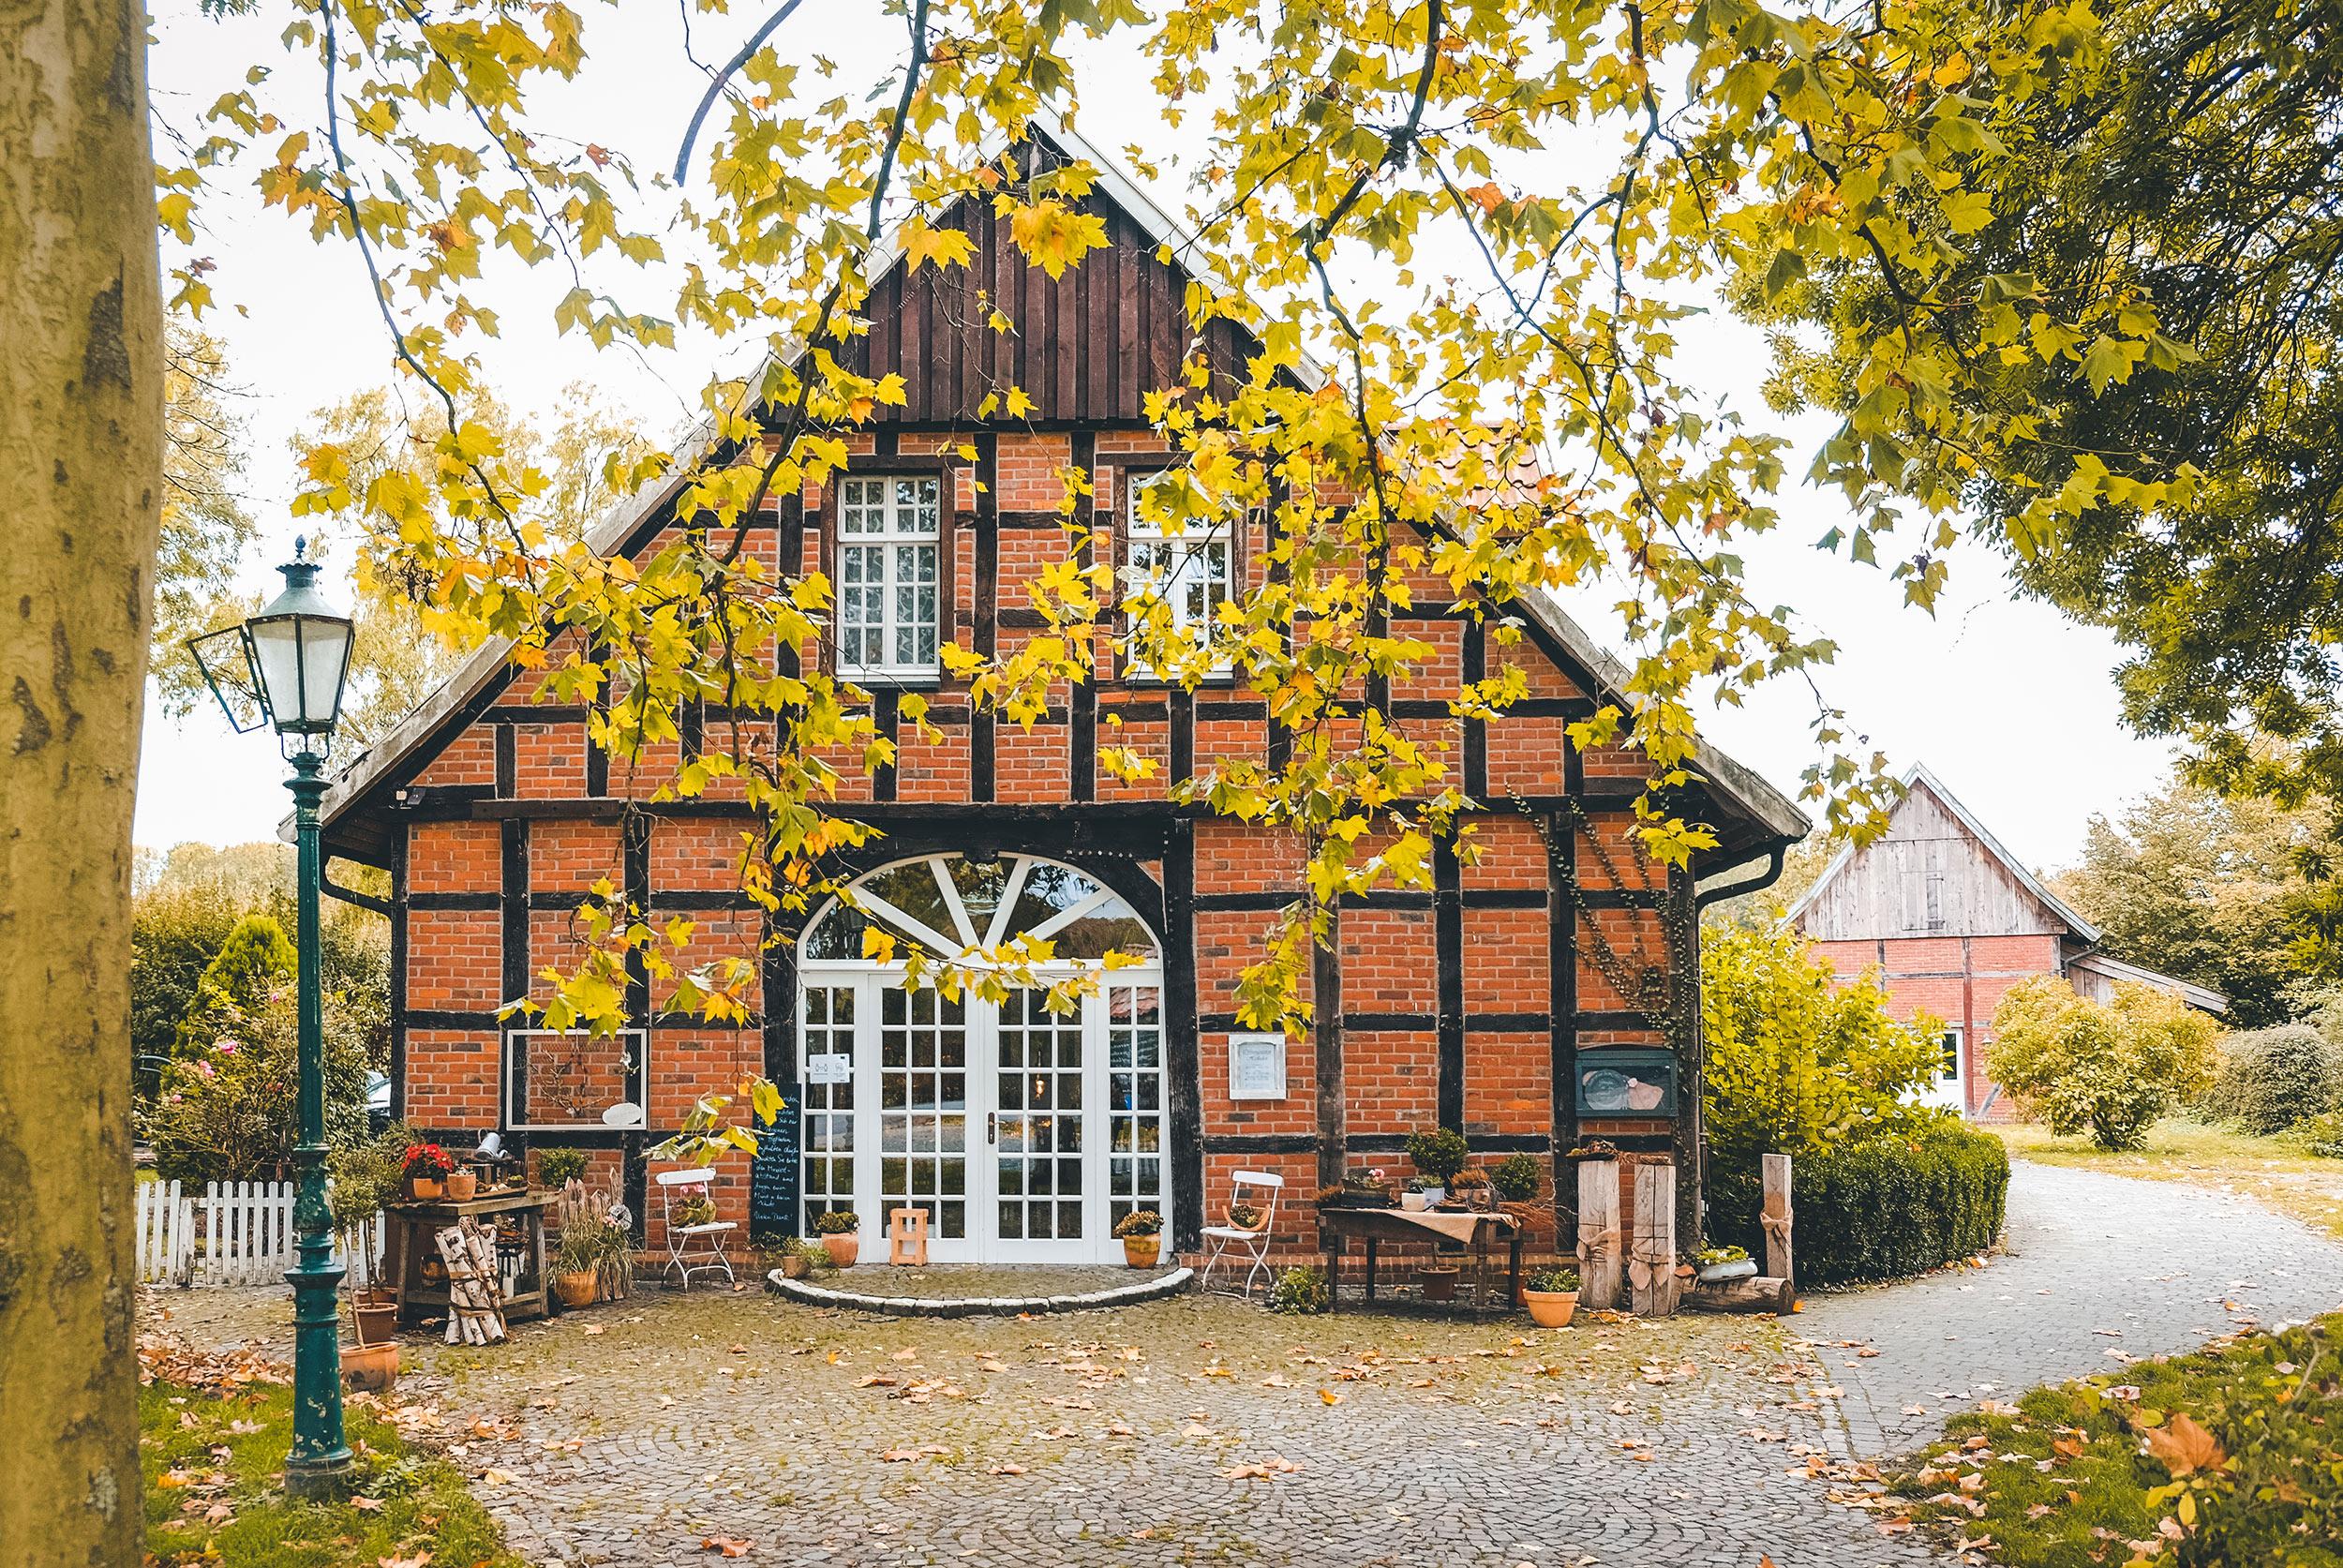 Hofladen Schulze Rötering 3-Tagestour mit dem Camper im Münsterland